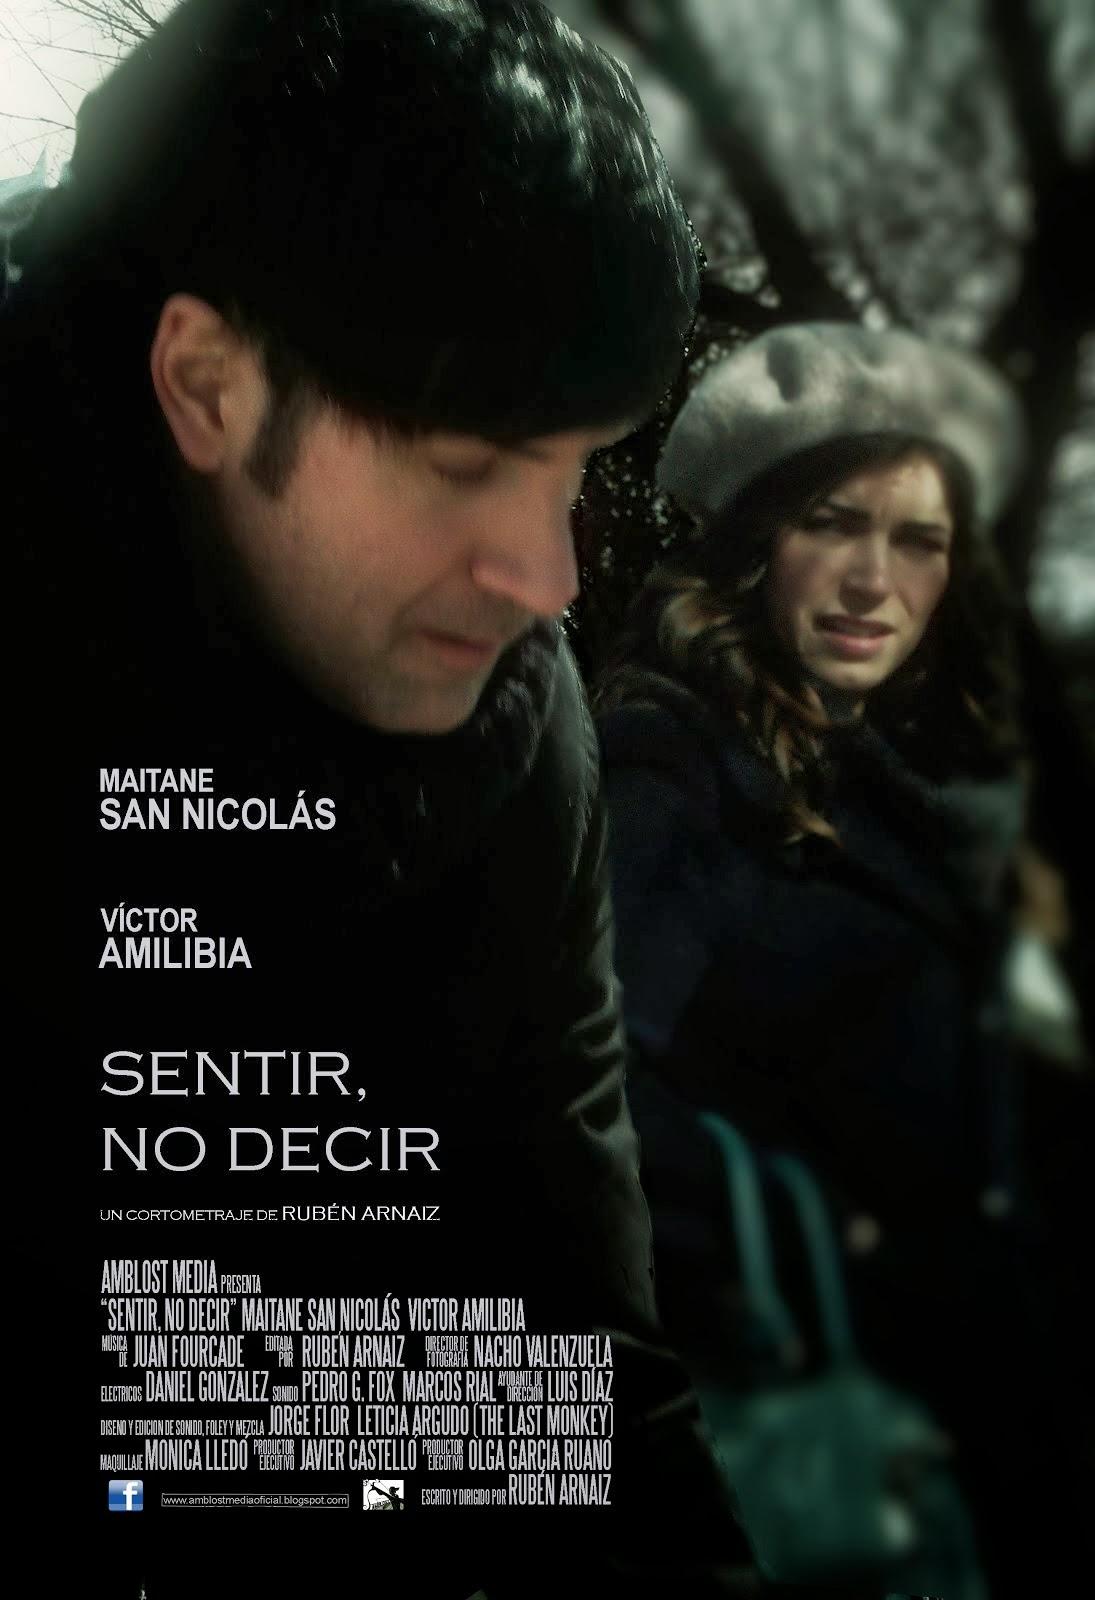 """SENTIR, NO DECIR"" (2013)"